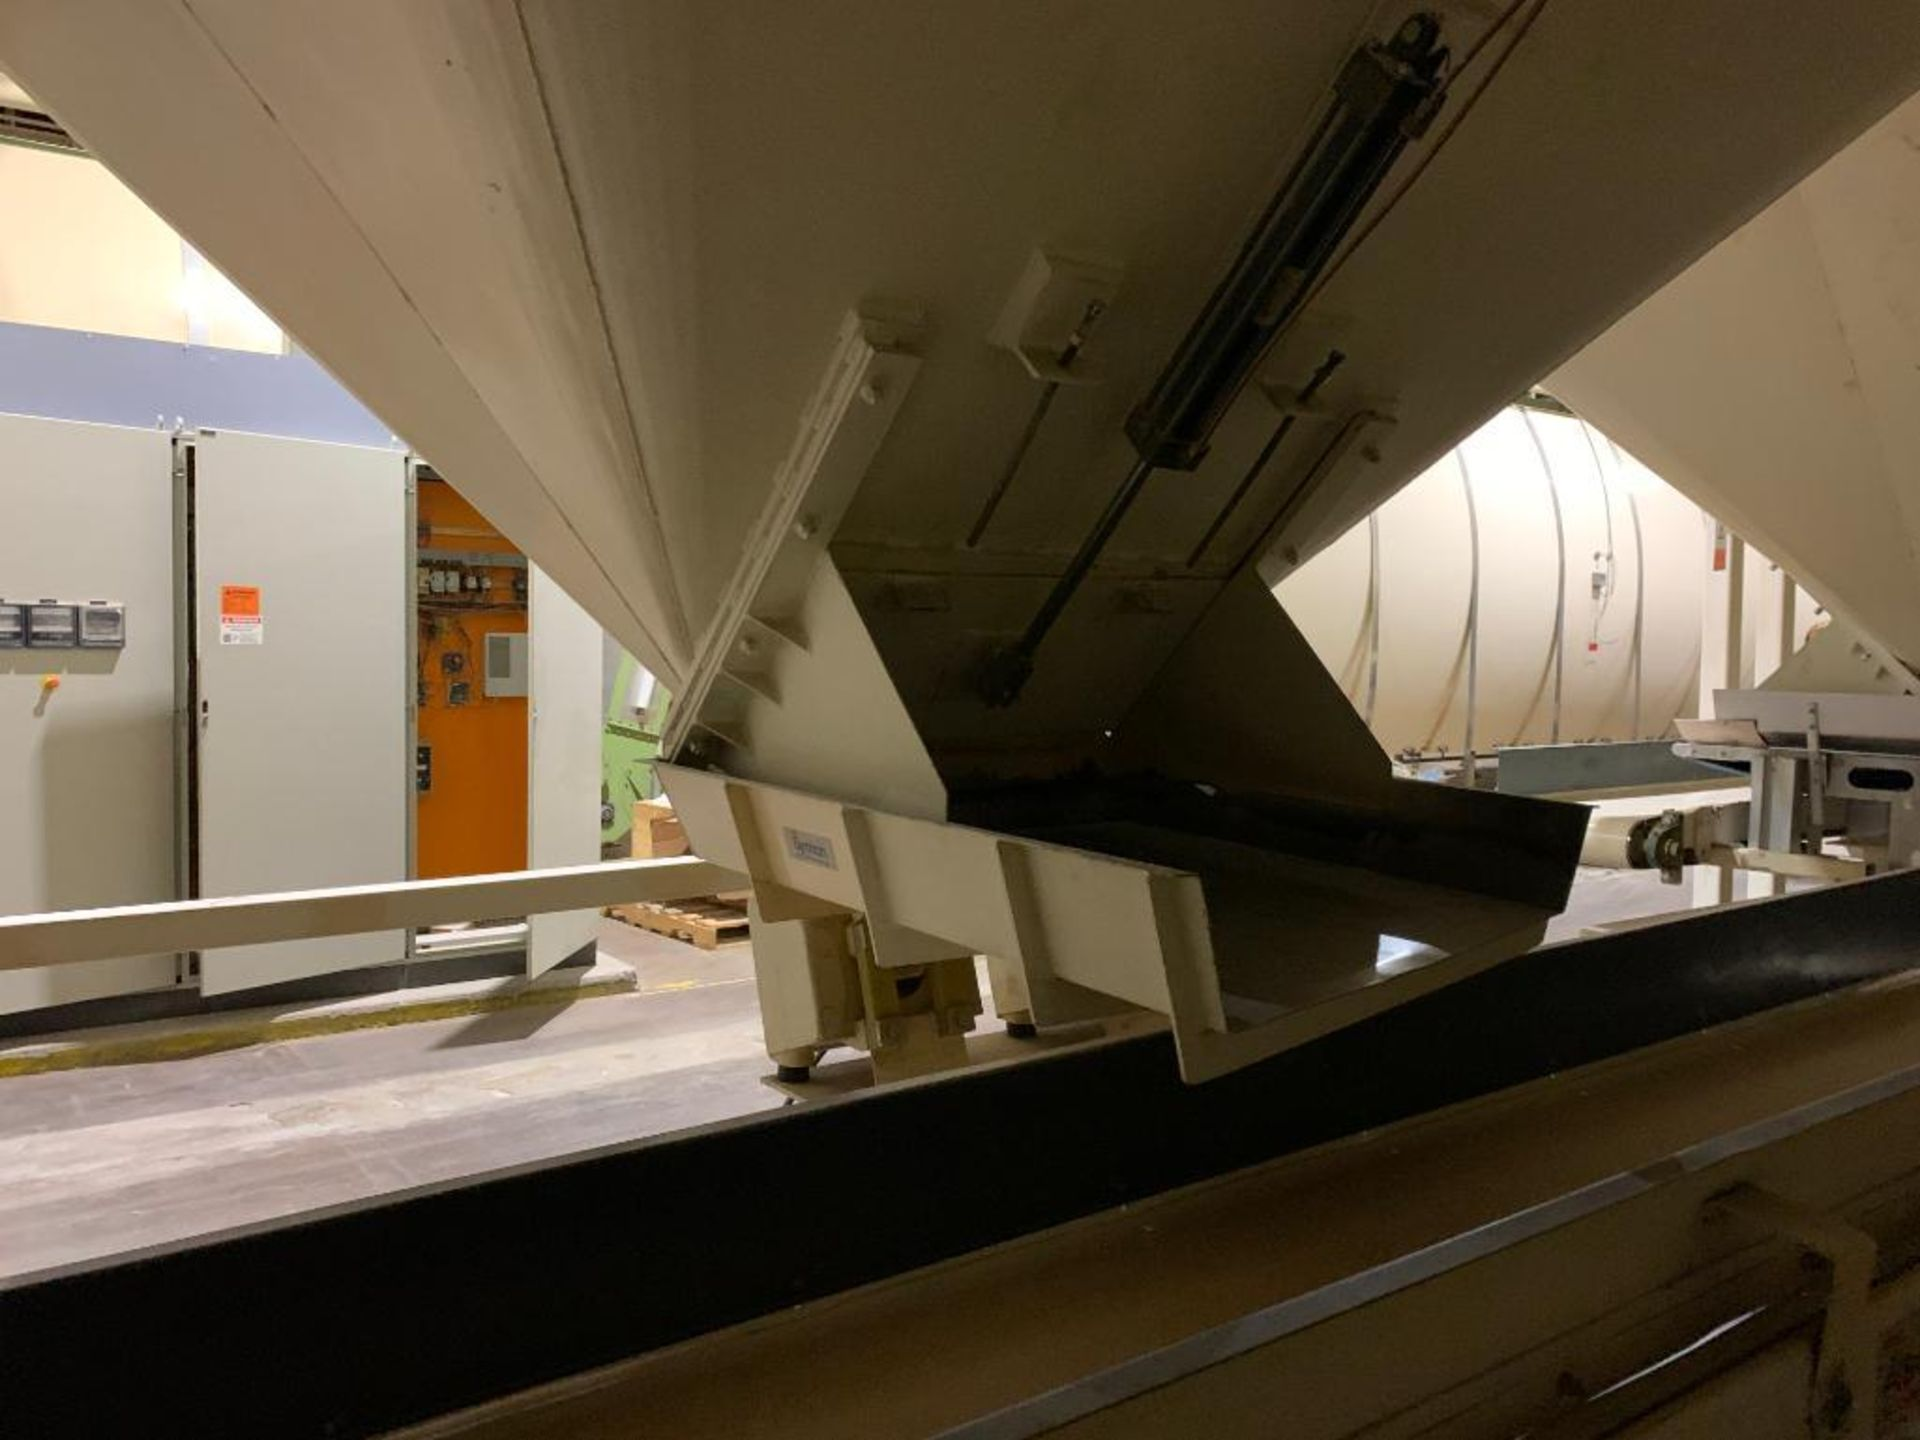 Aseeco mild steel cone bottom bulk storage bin - Image 20 of 27